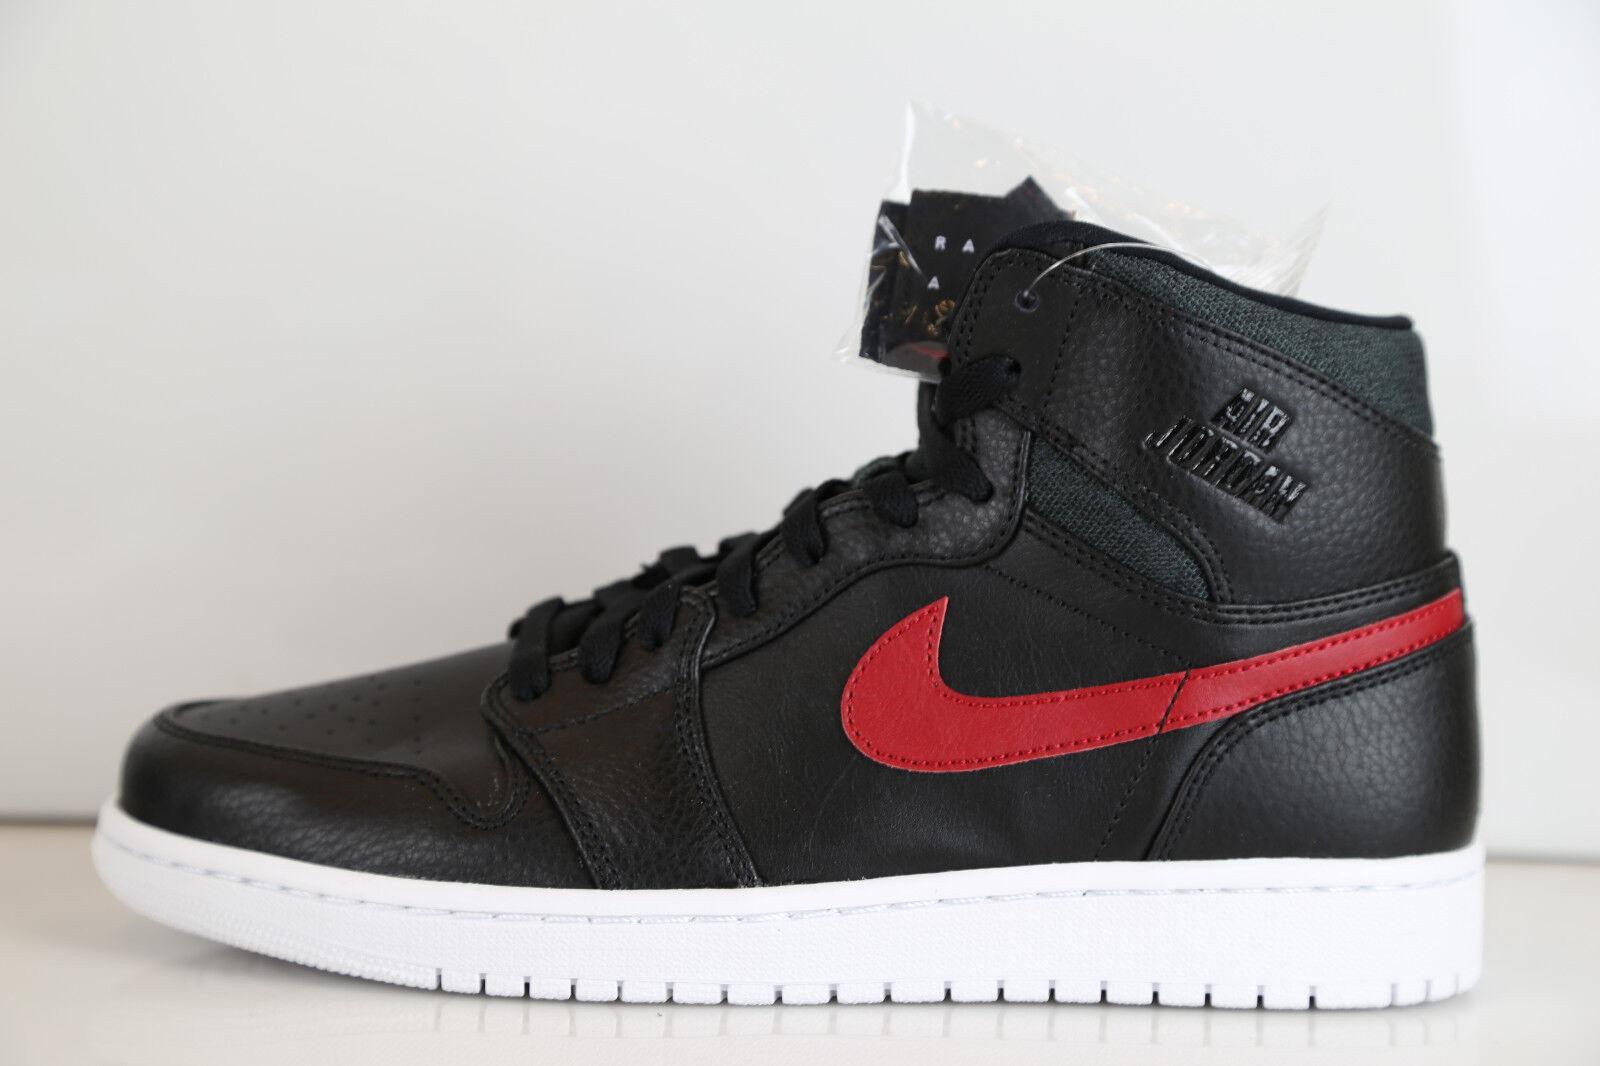 Nike High Air Jordan Retro 1 High Nike Raro Aire Negro Gimnasio Rojo 32550012 714 criados 3 11 6 2d2244